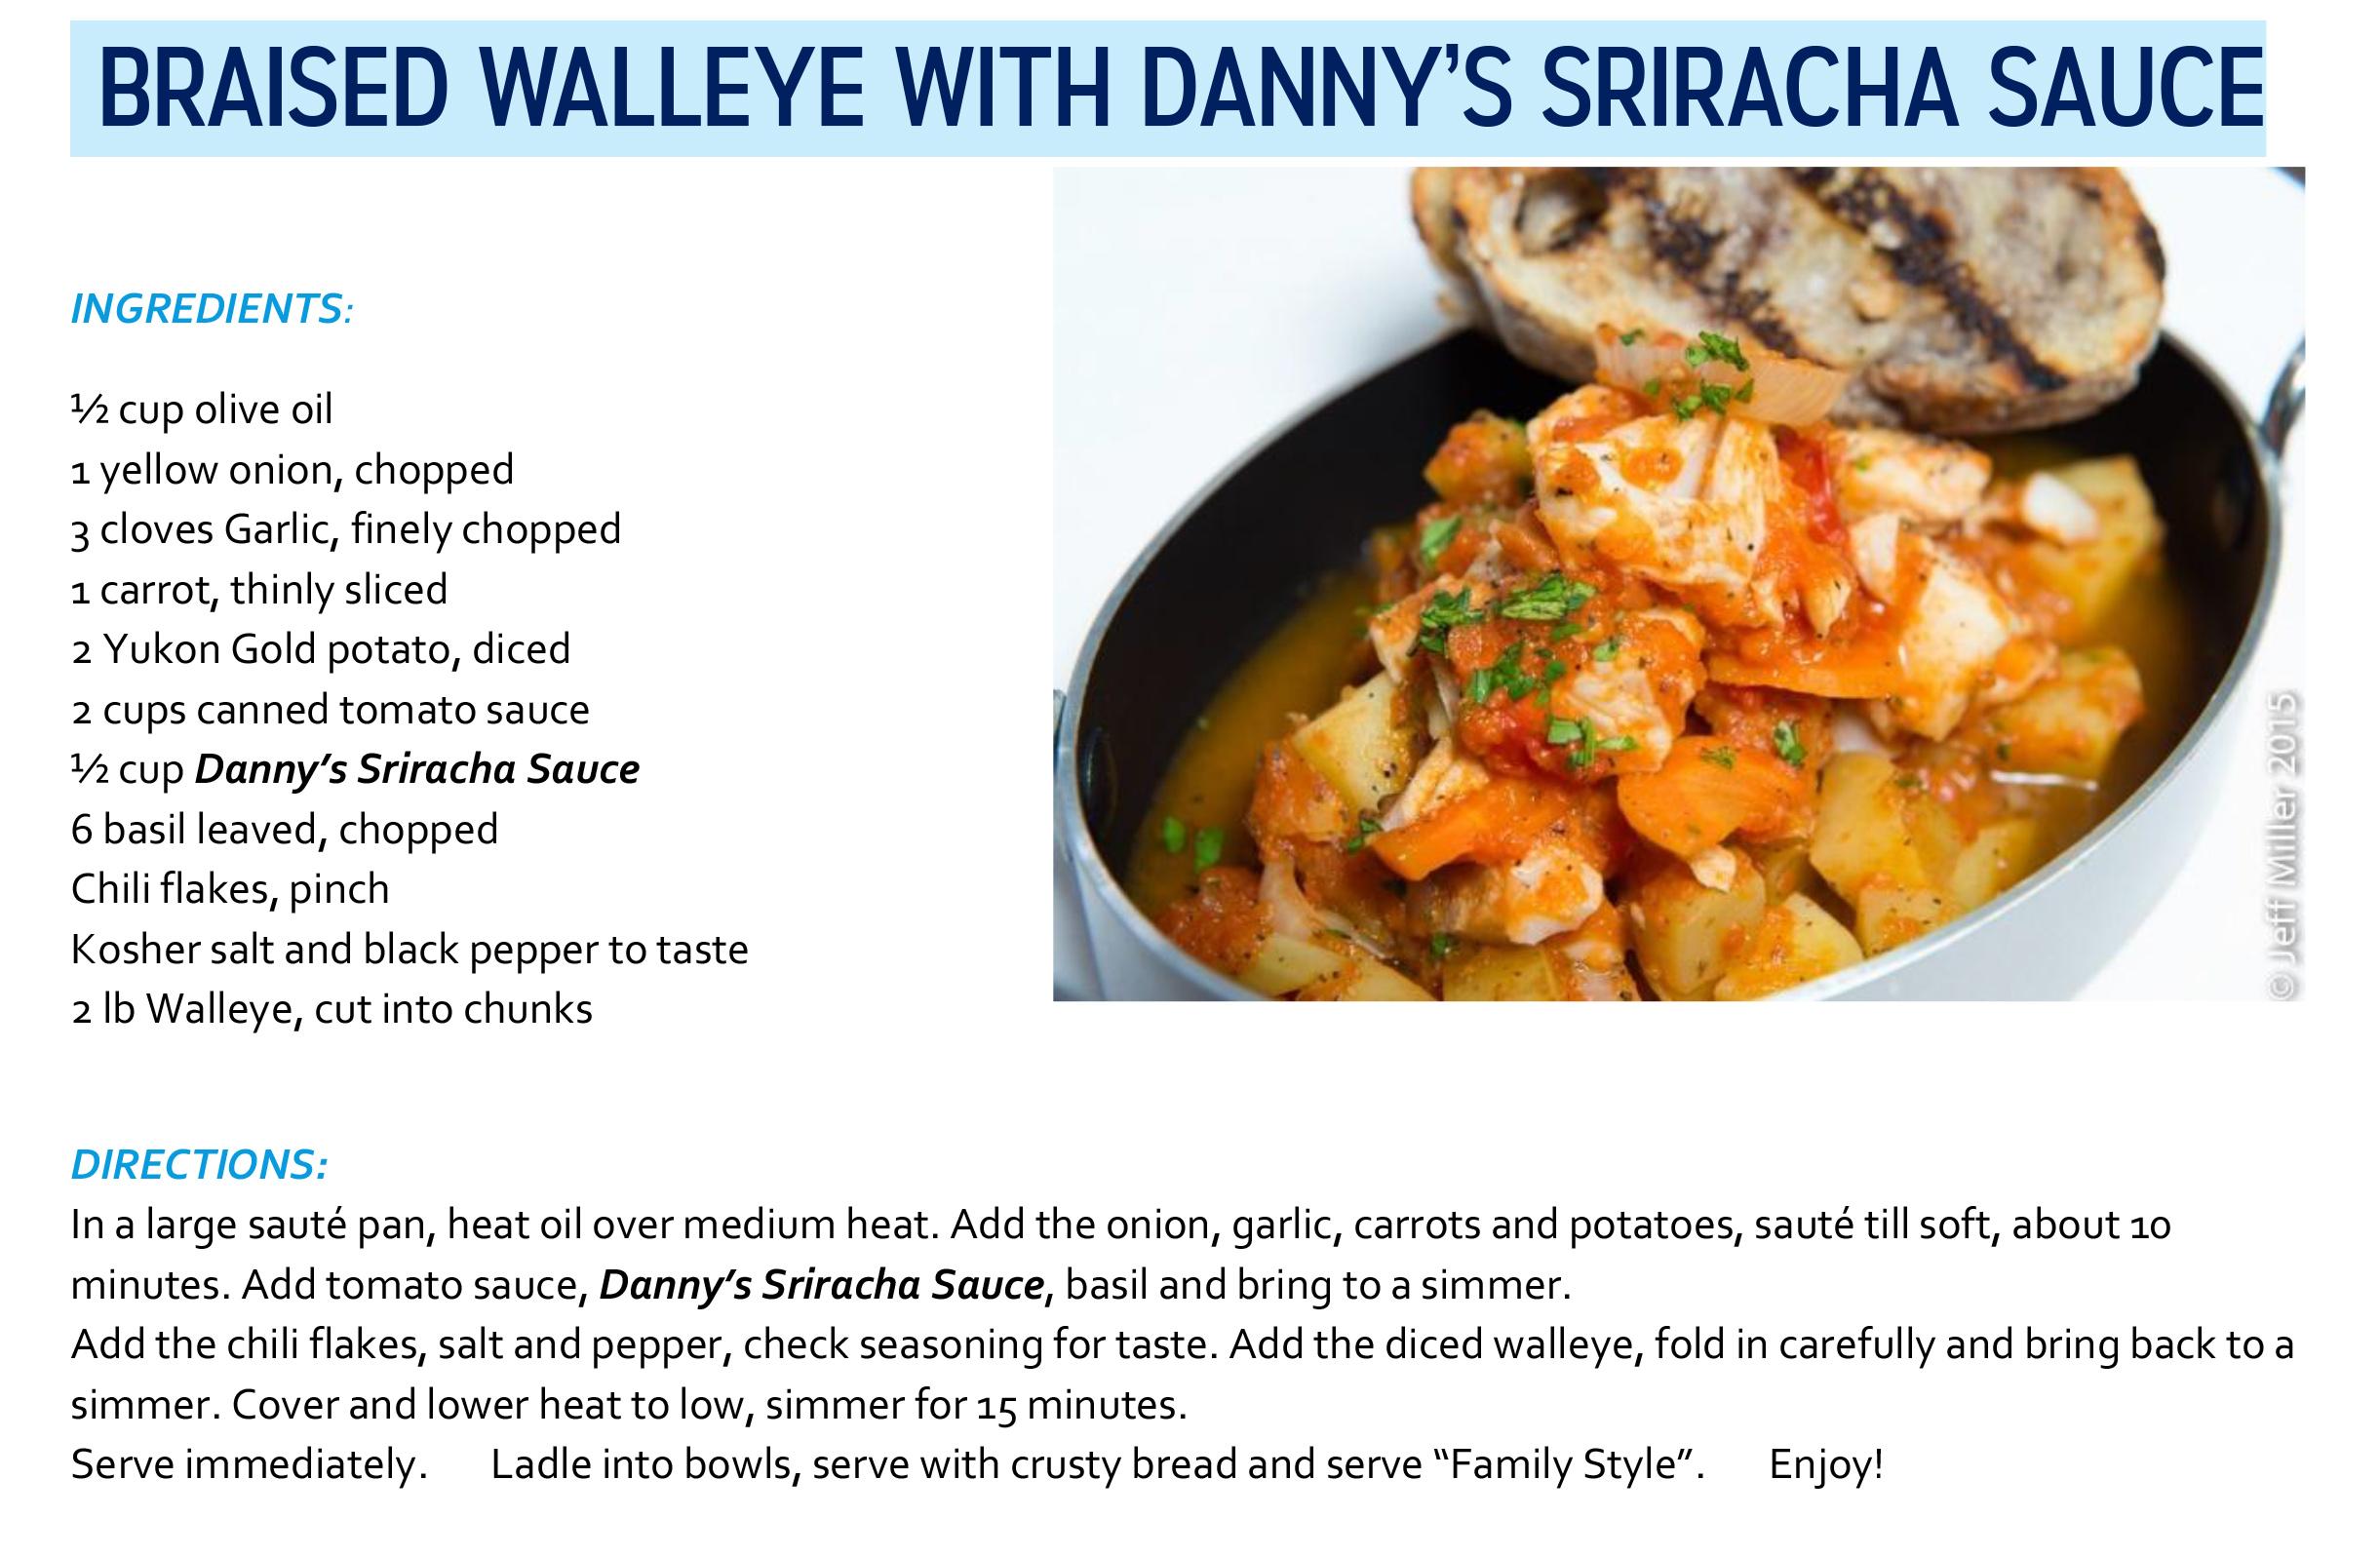 Braised Walleye with Danny's Sriracha Sauce